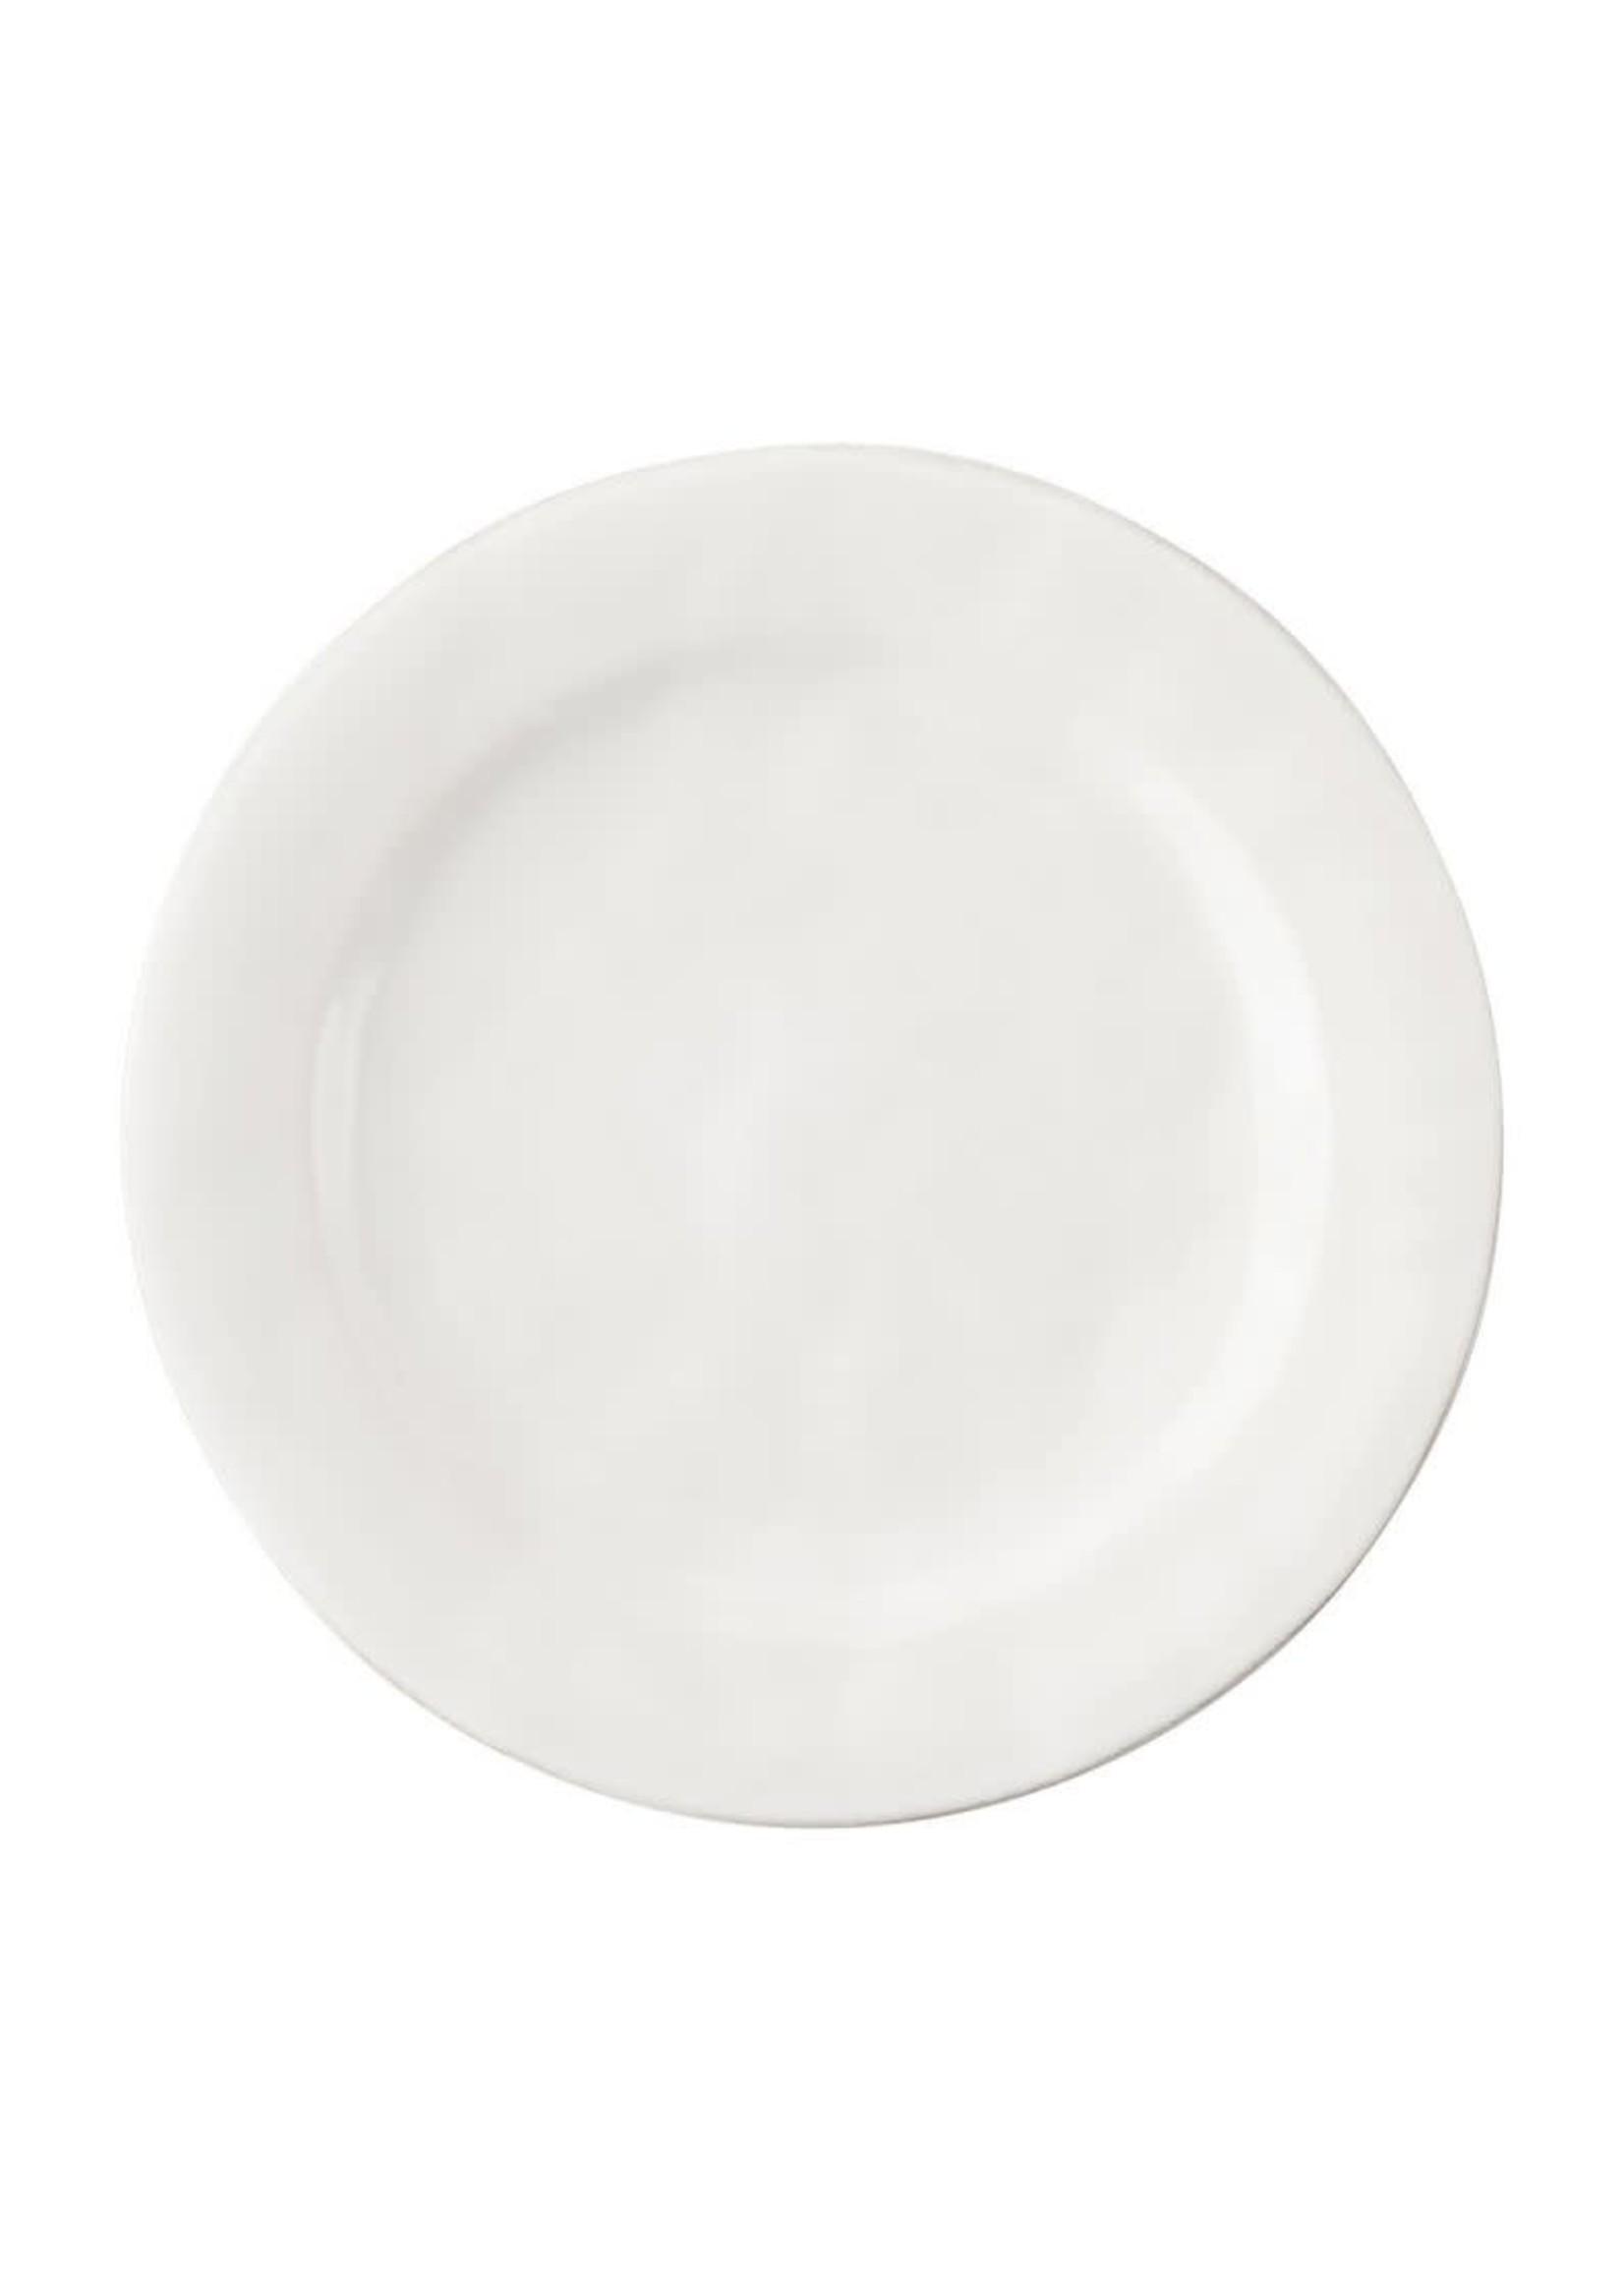 Juliska Puro - Salad/Dessert Plate